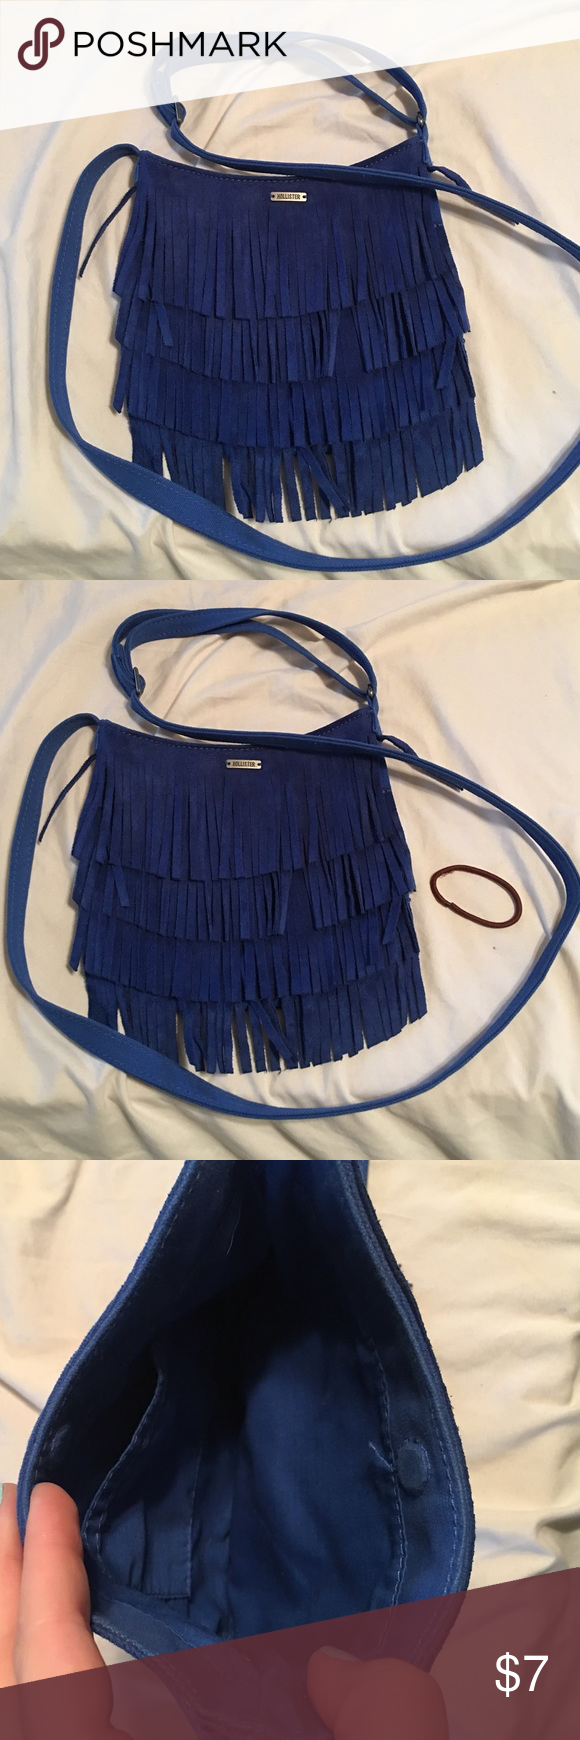 Blue fringe hollister crossbody bag Never used, SO CUTE 💙💙 Hollister Bags Crossbody Bags